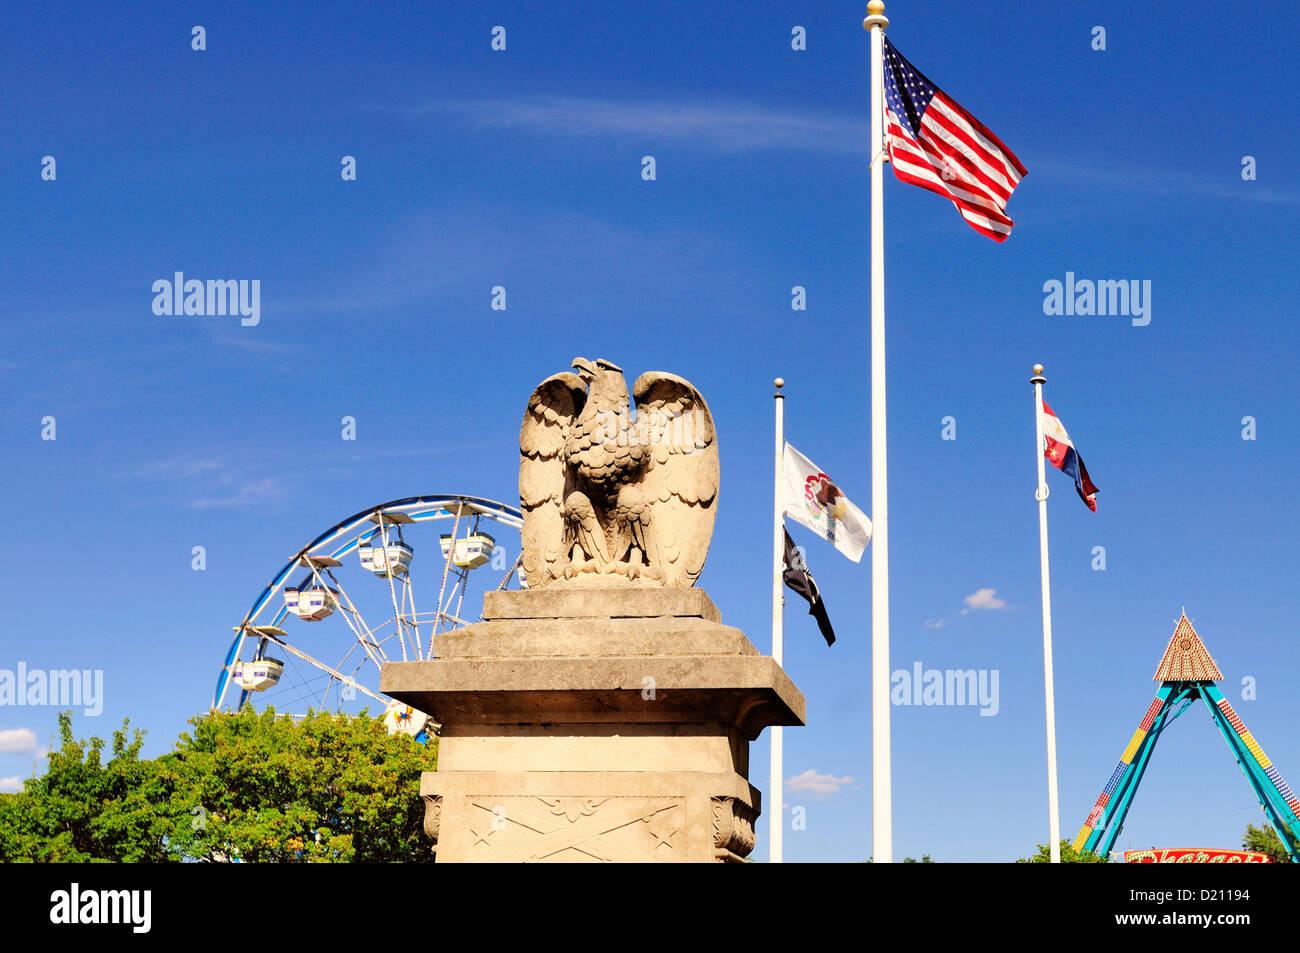 USA Illinois South Elgin World War I Memorial and Ferris wheel at summer community fair. - Stock Image